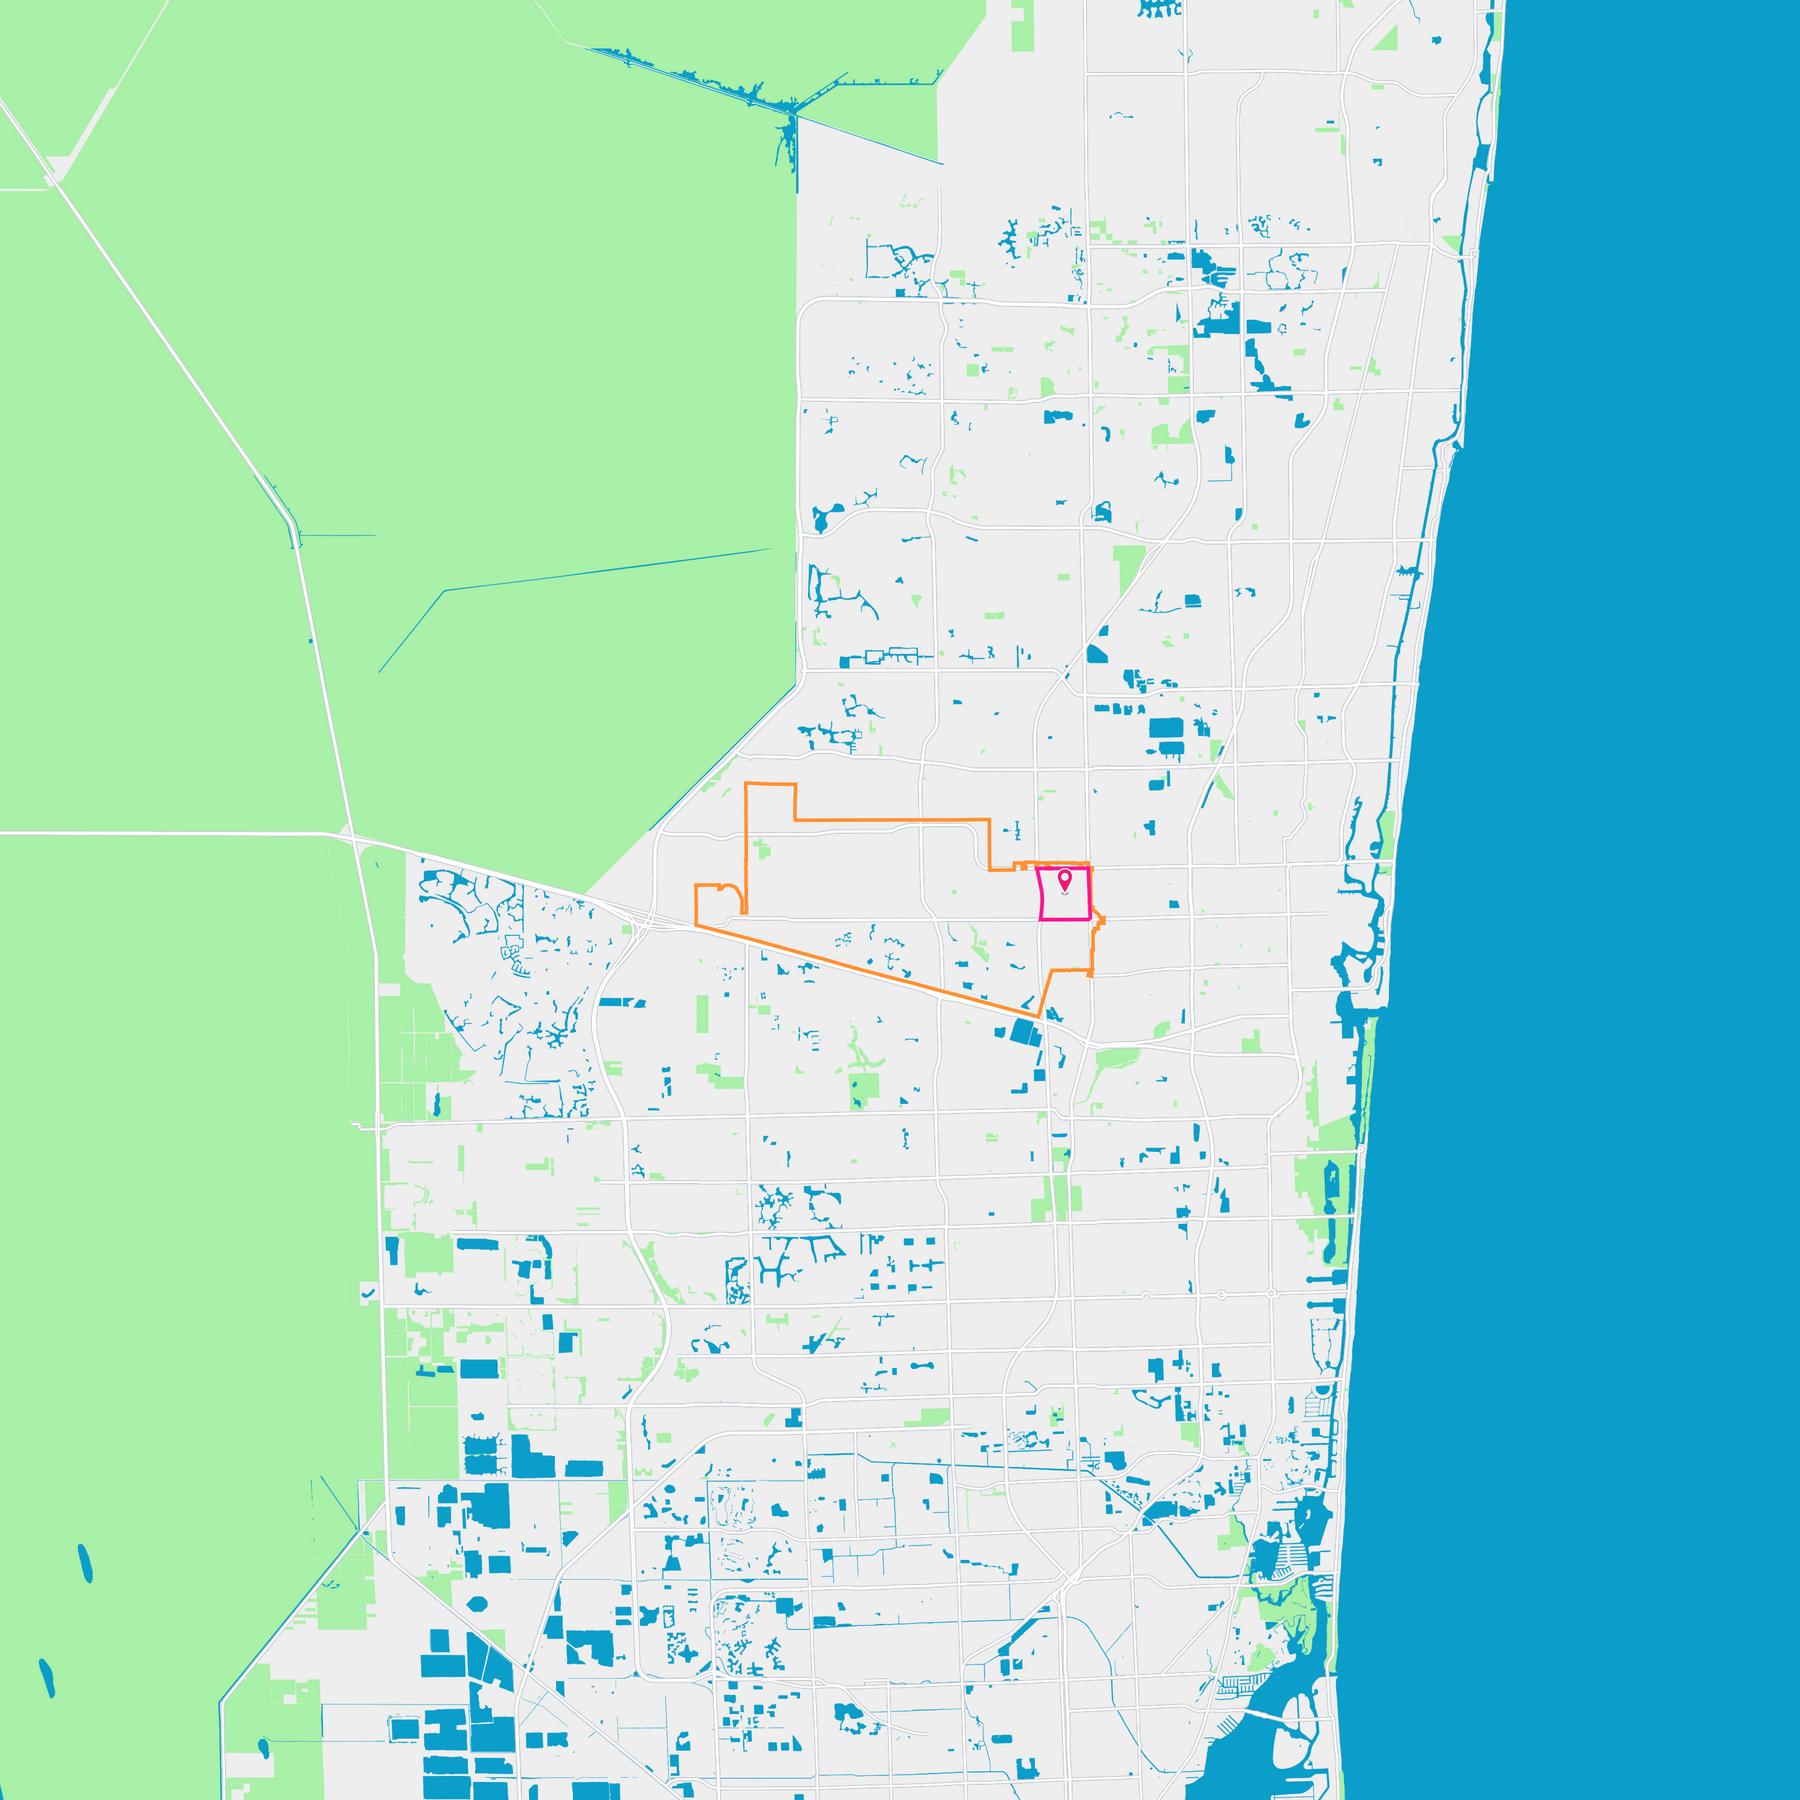 Apartments For Rent In Plantation Fl: Plantation Park East, Plantation FL